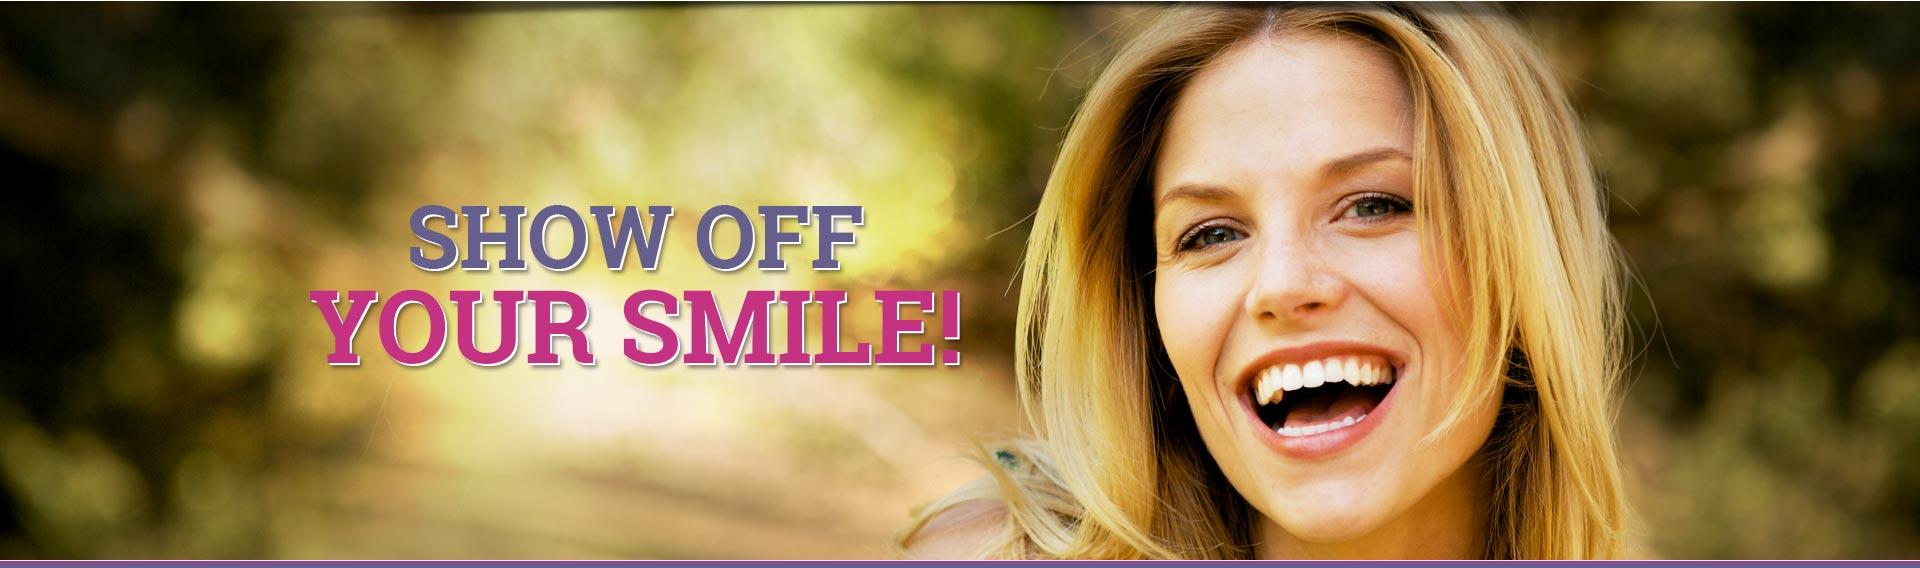 Carlyn-Phucas-Orthodontics-Marlton-Turnersville-NJ-Beautiful-Girl-Smile-1920